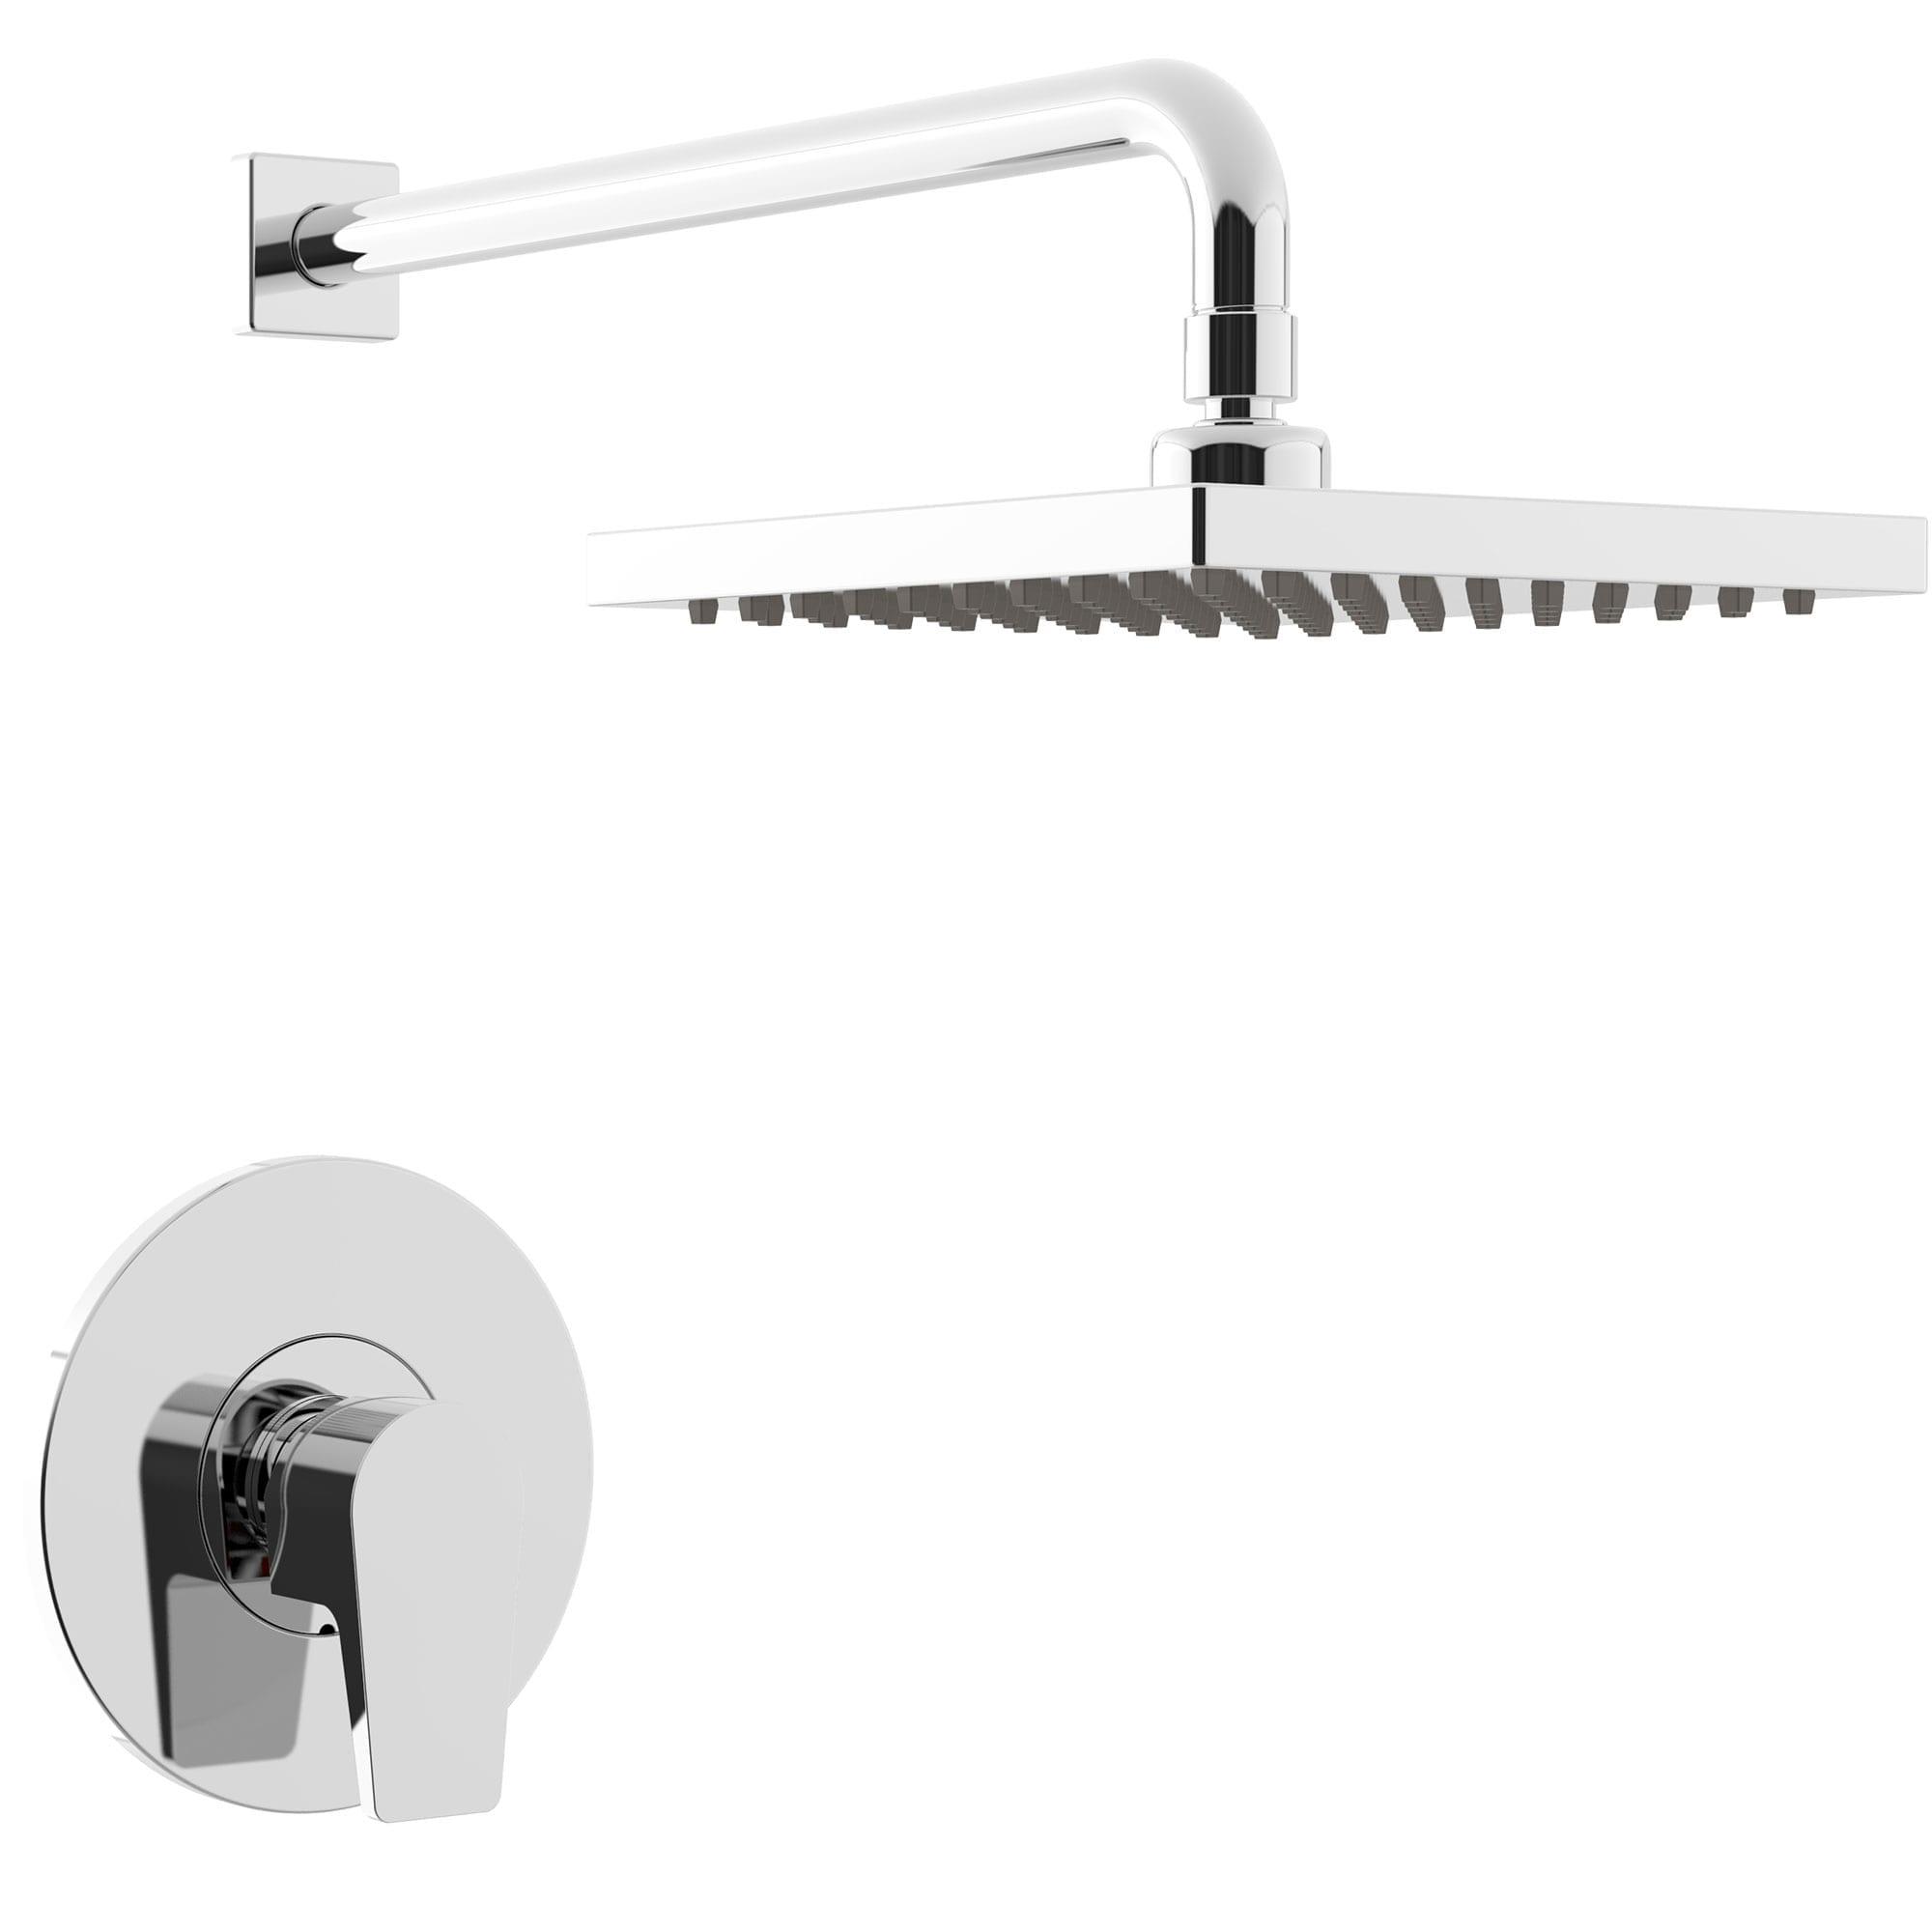 kit robinet pour douche garniture pour valve pression quilibr e b langer upt. Black Bedroom Furniture Sets. Home Design Ideas